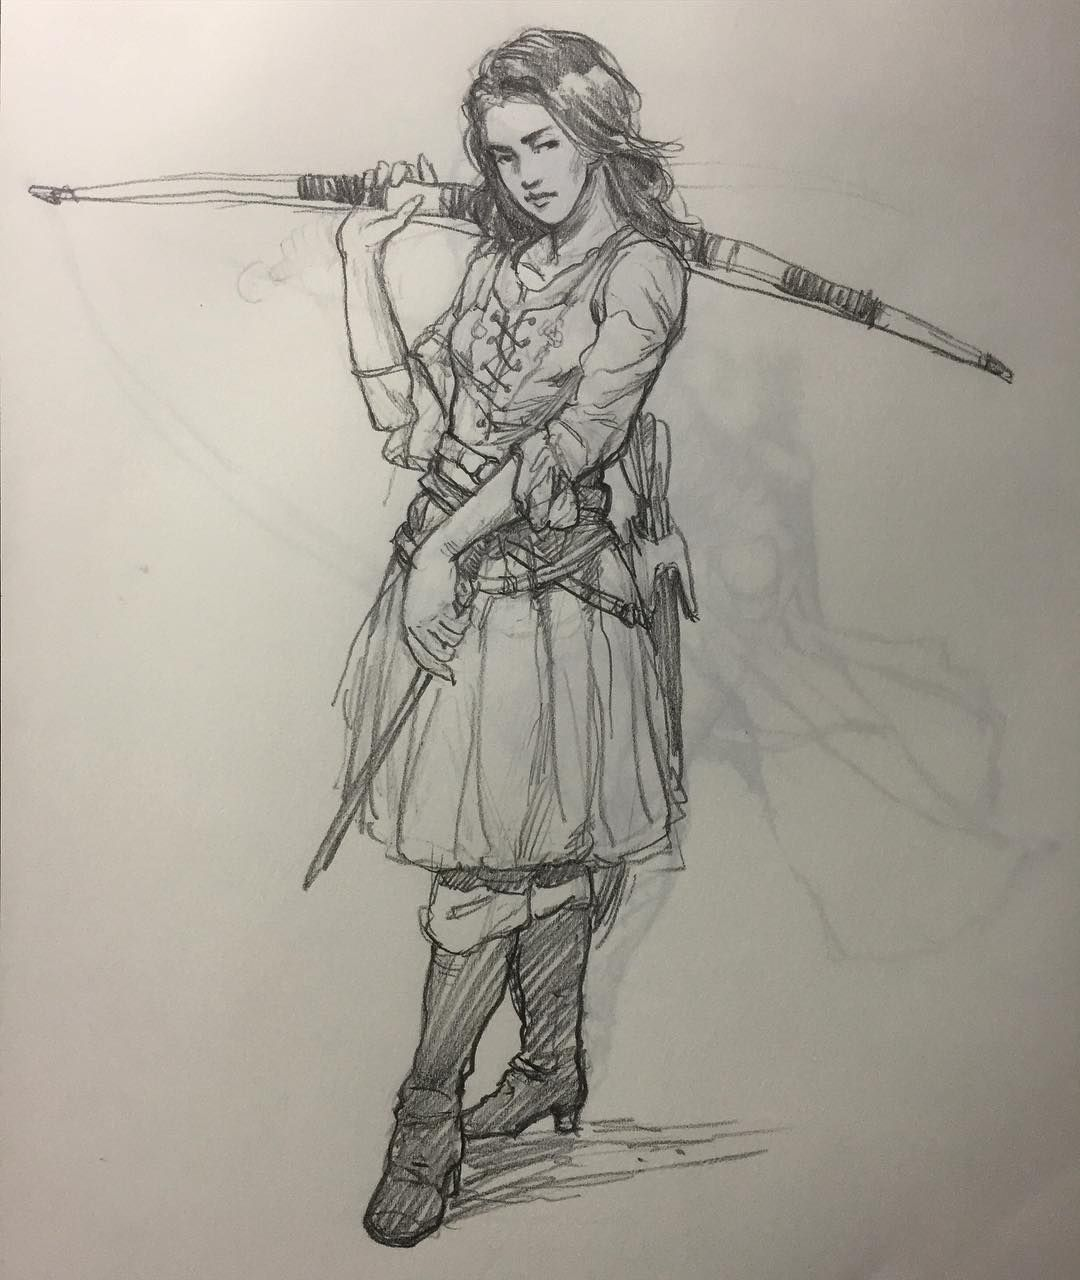 Badass Archer Sketch Pencil Pencildrawing Drawing Art Archery